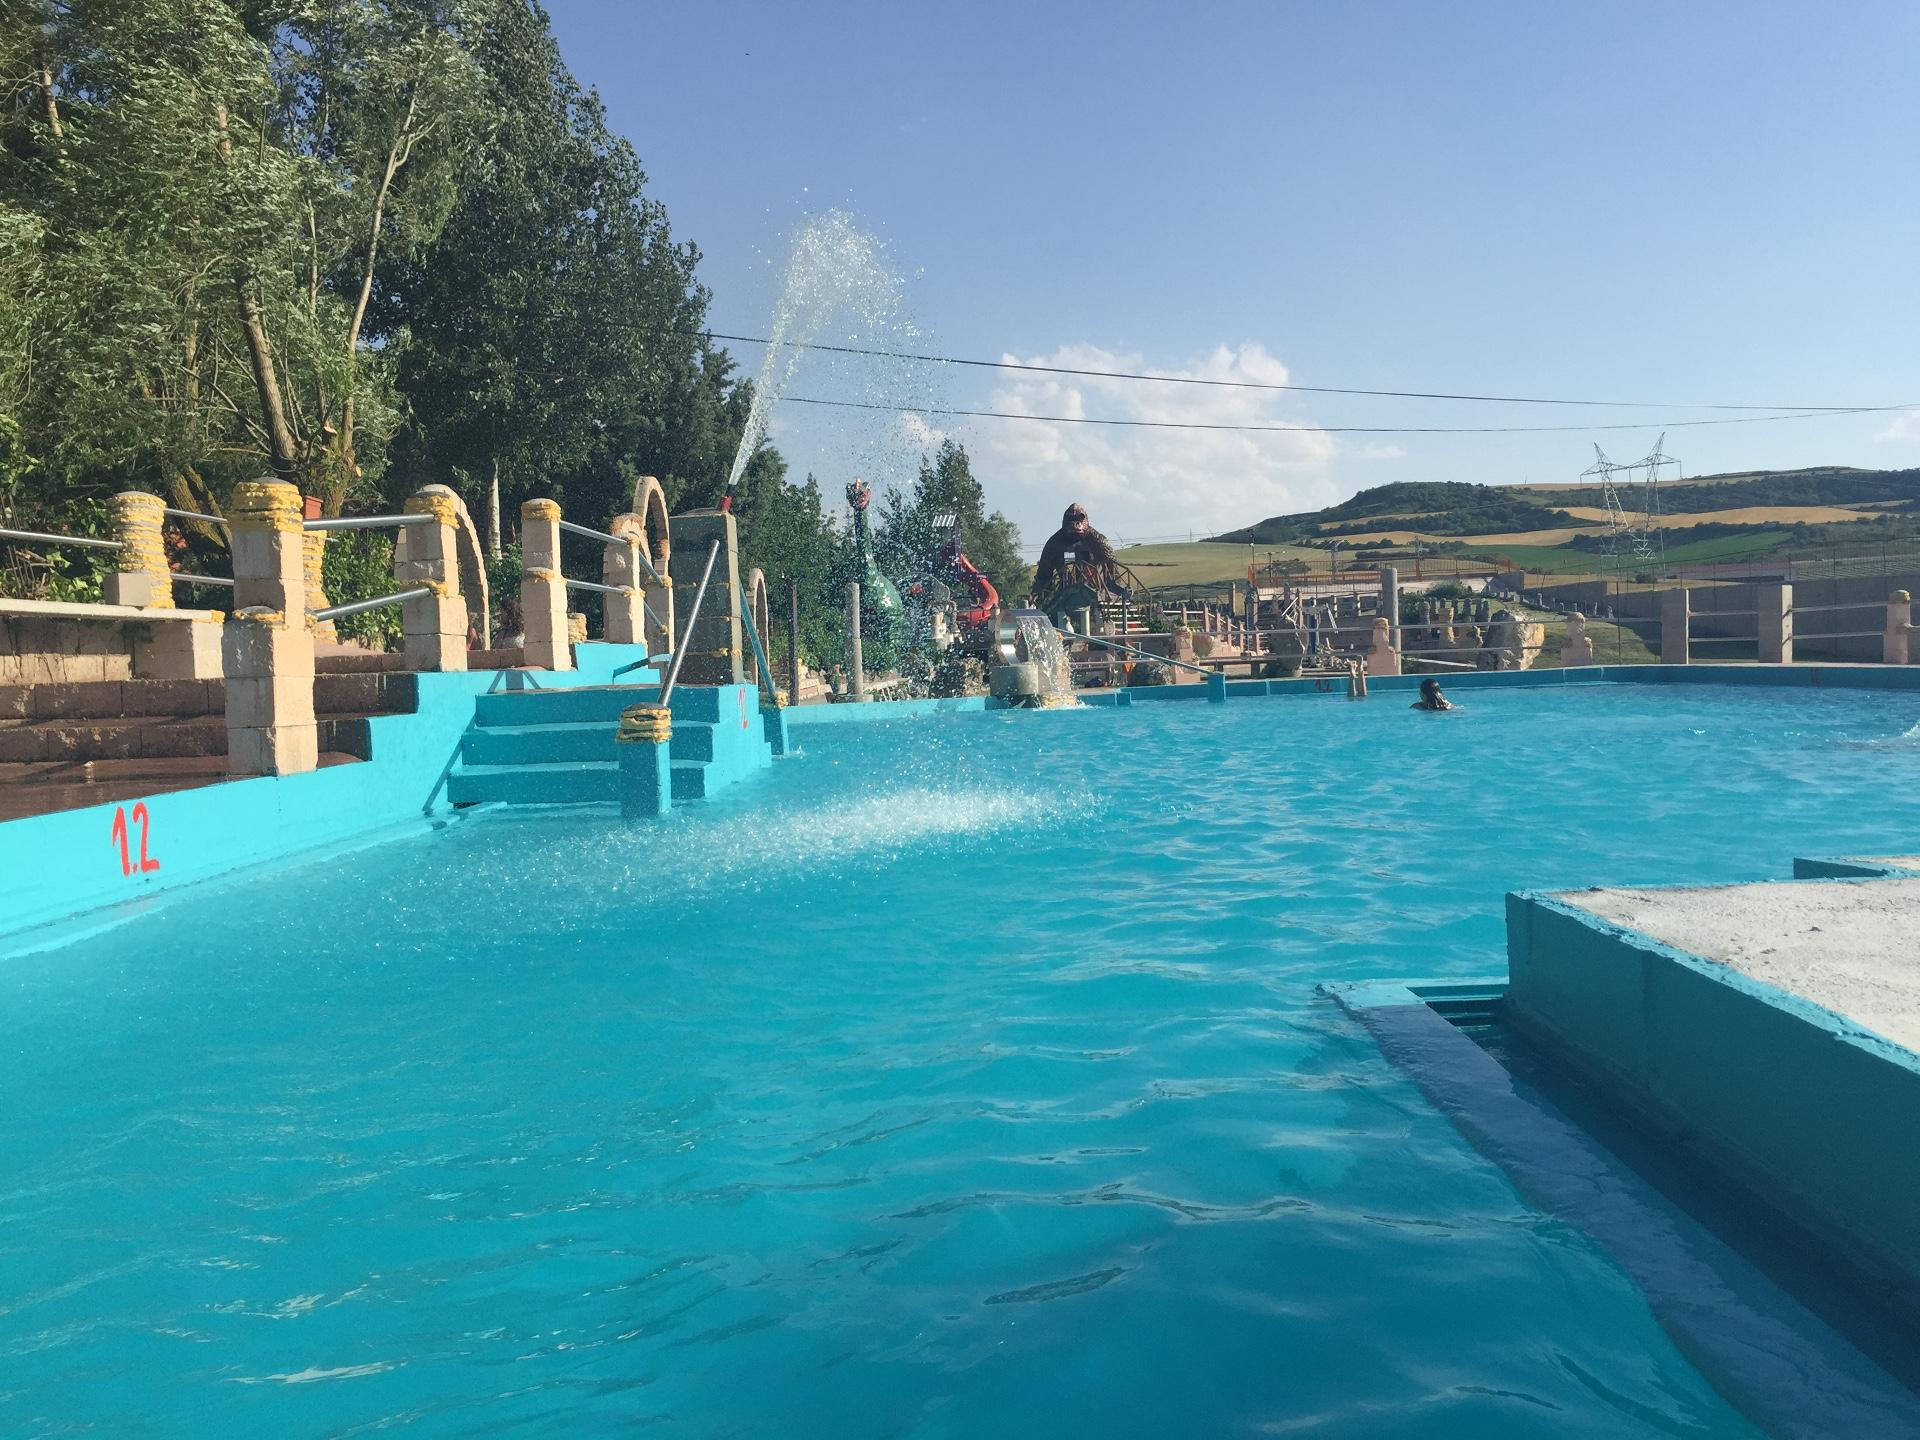 Piscinas camping motel piscinas municipales pic n for Piscina climatizada madrid